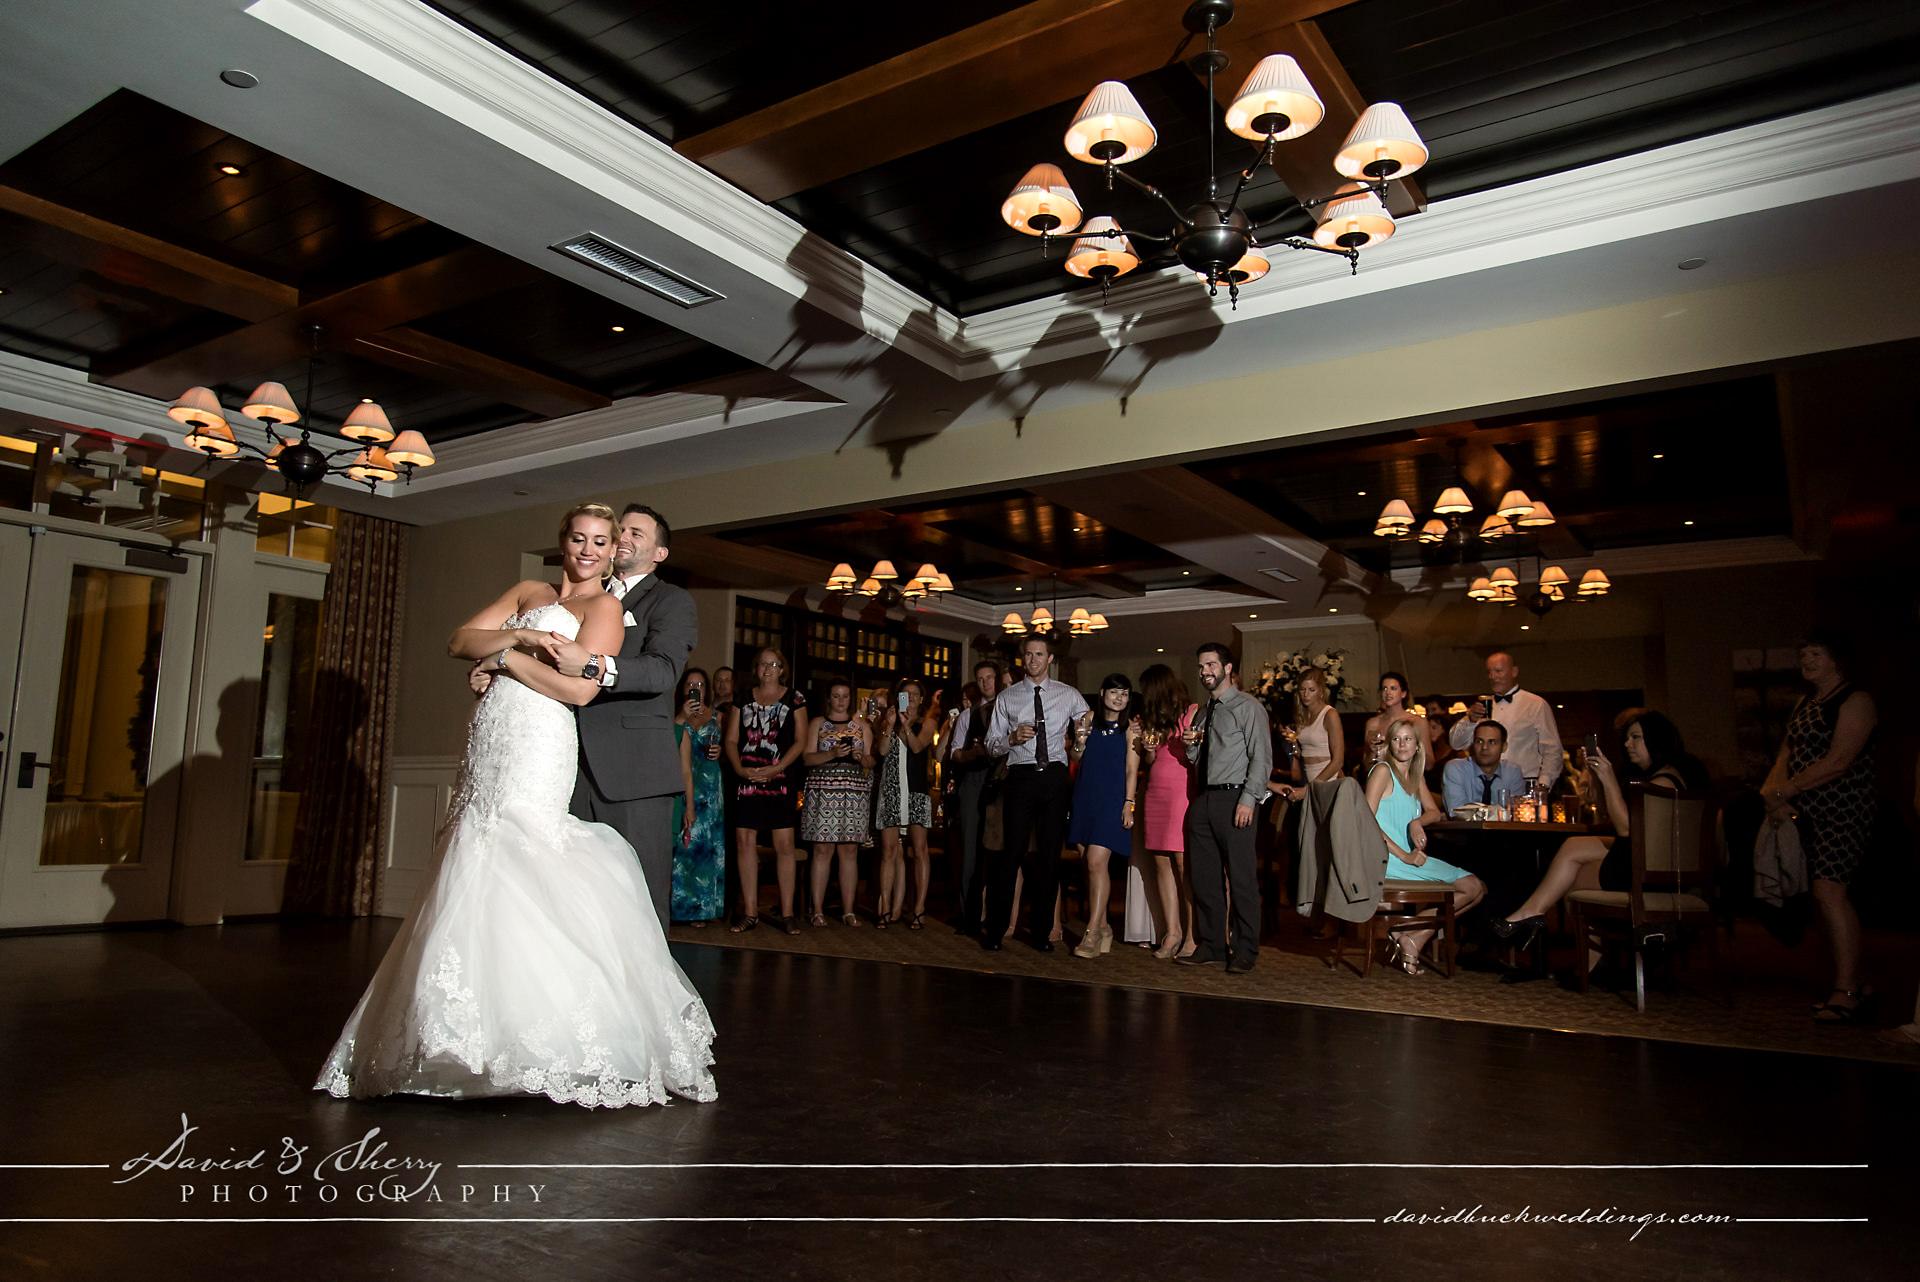 Cobble_Beach_Wedding_Photography_033